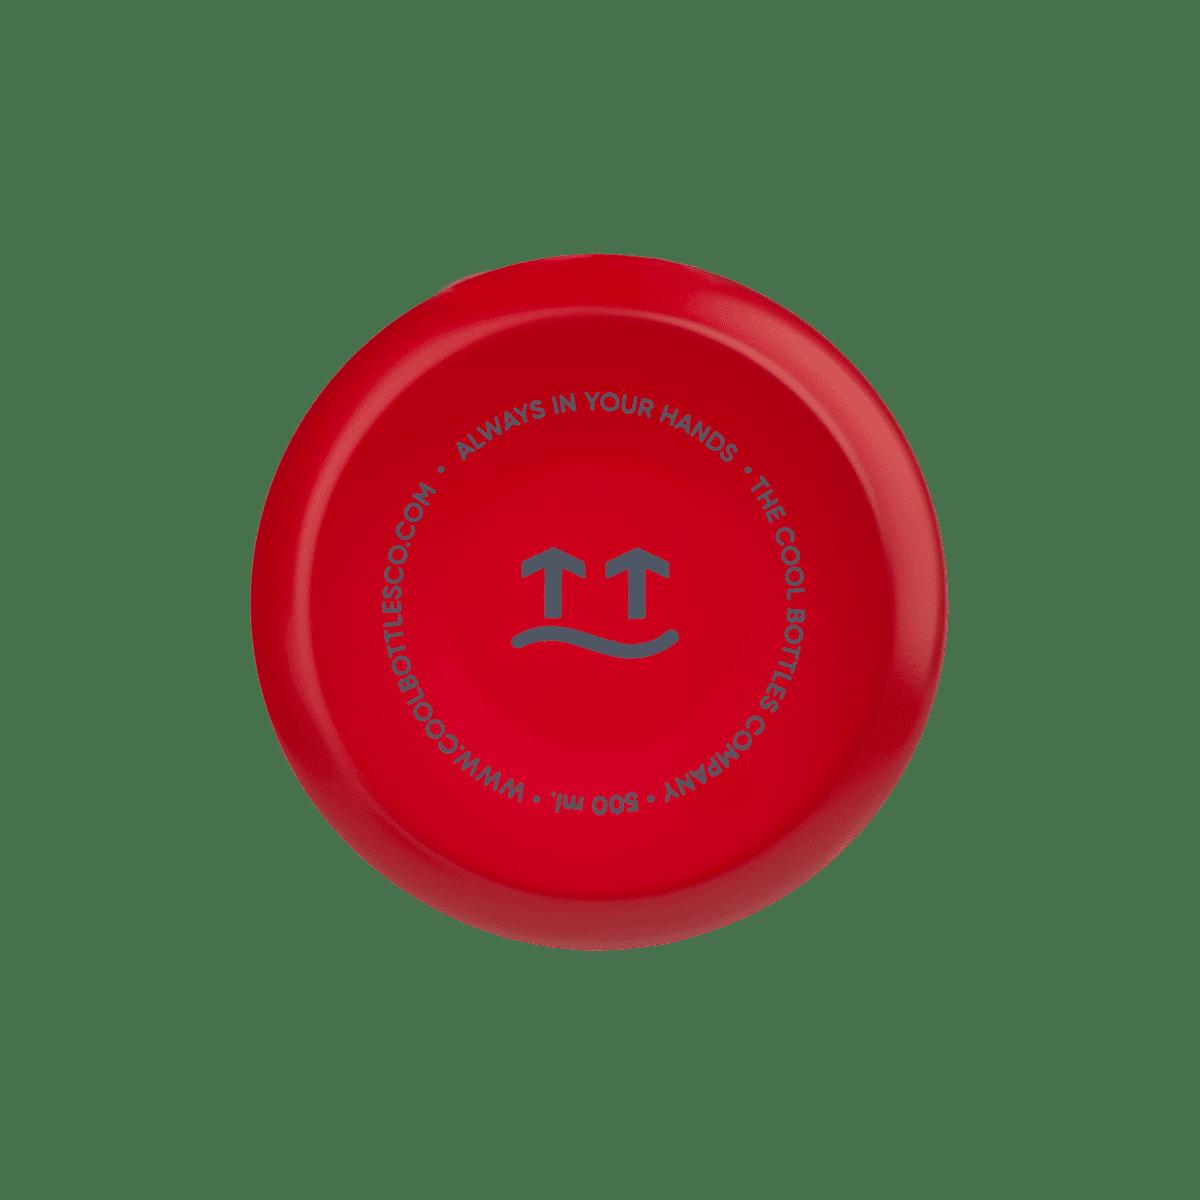 Vivid_Red-cool-bottles-03